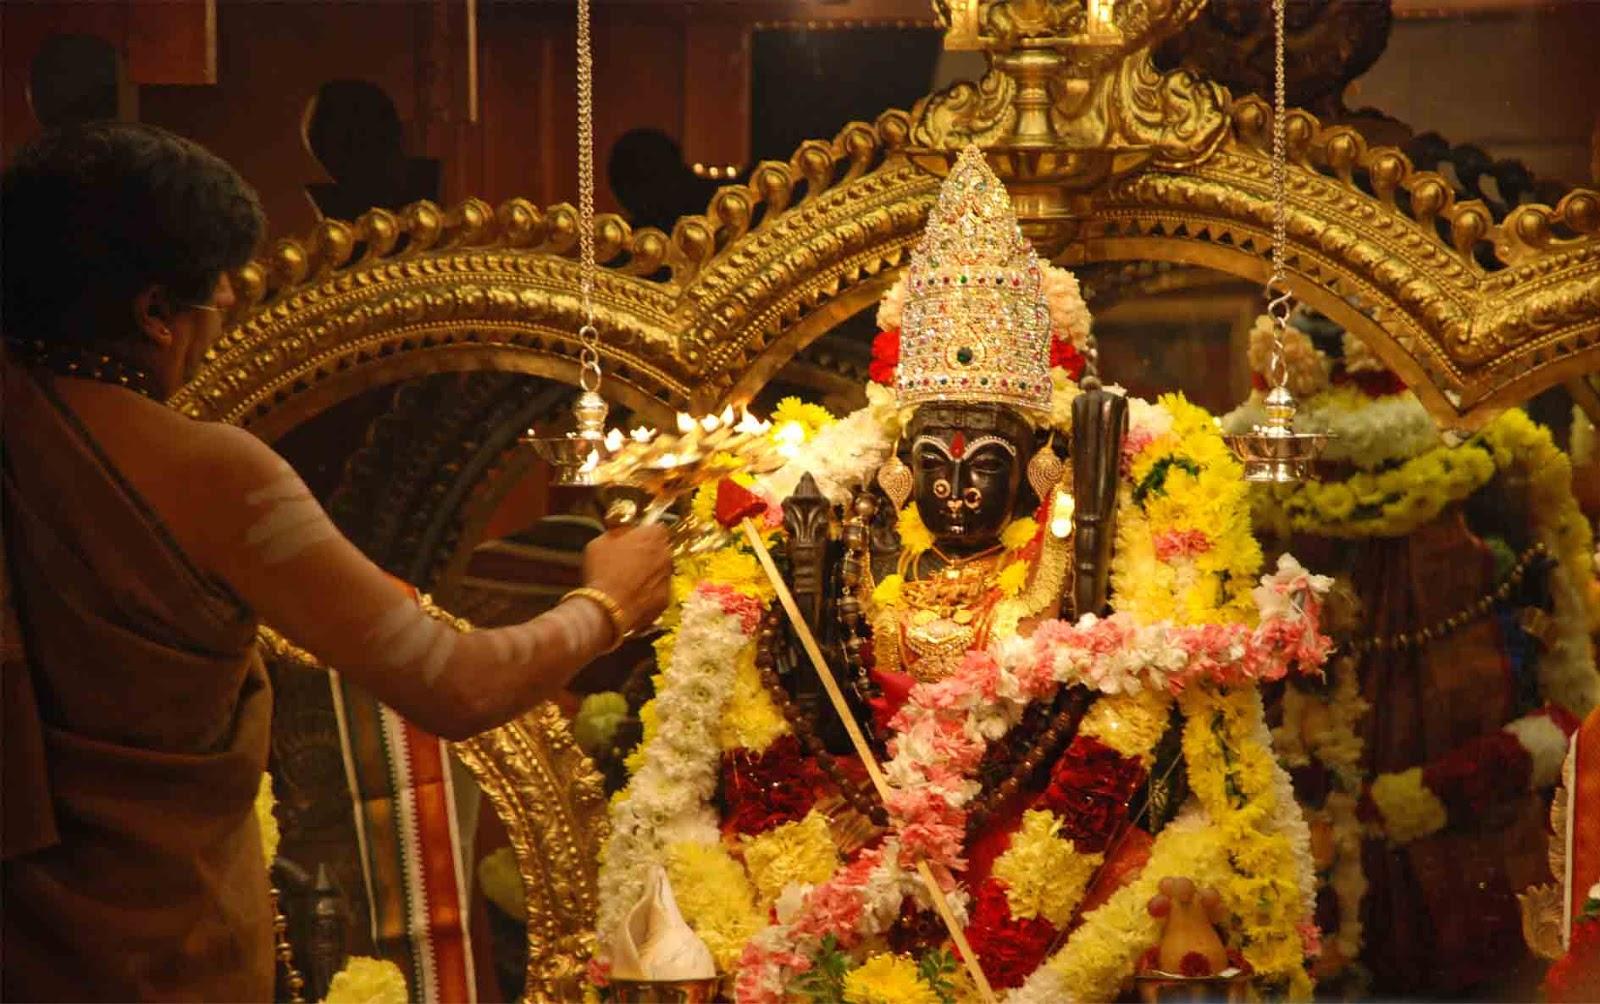 what major hindu ideas does this picture illustrate - SANATANA DHARMA Why do we worship Idols